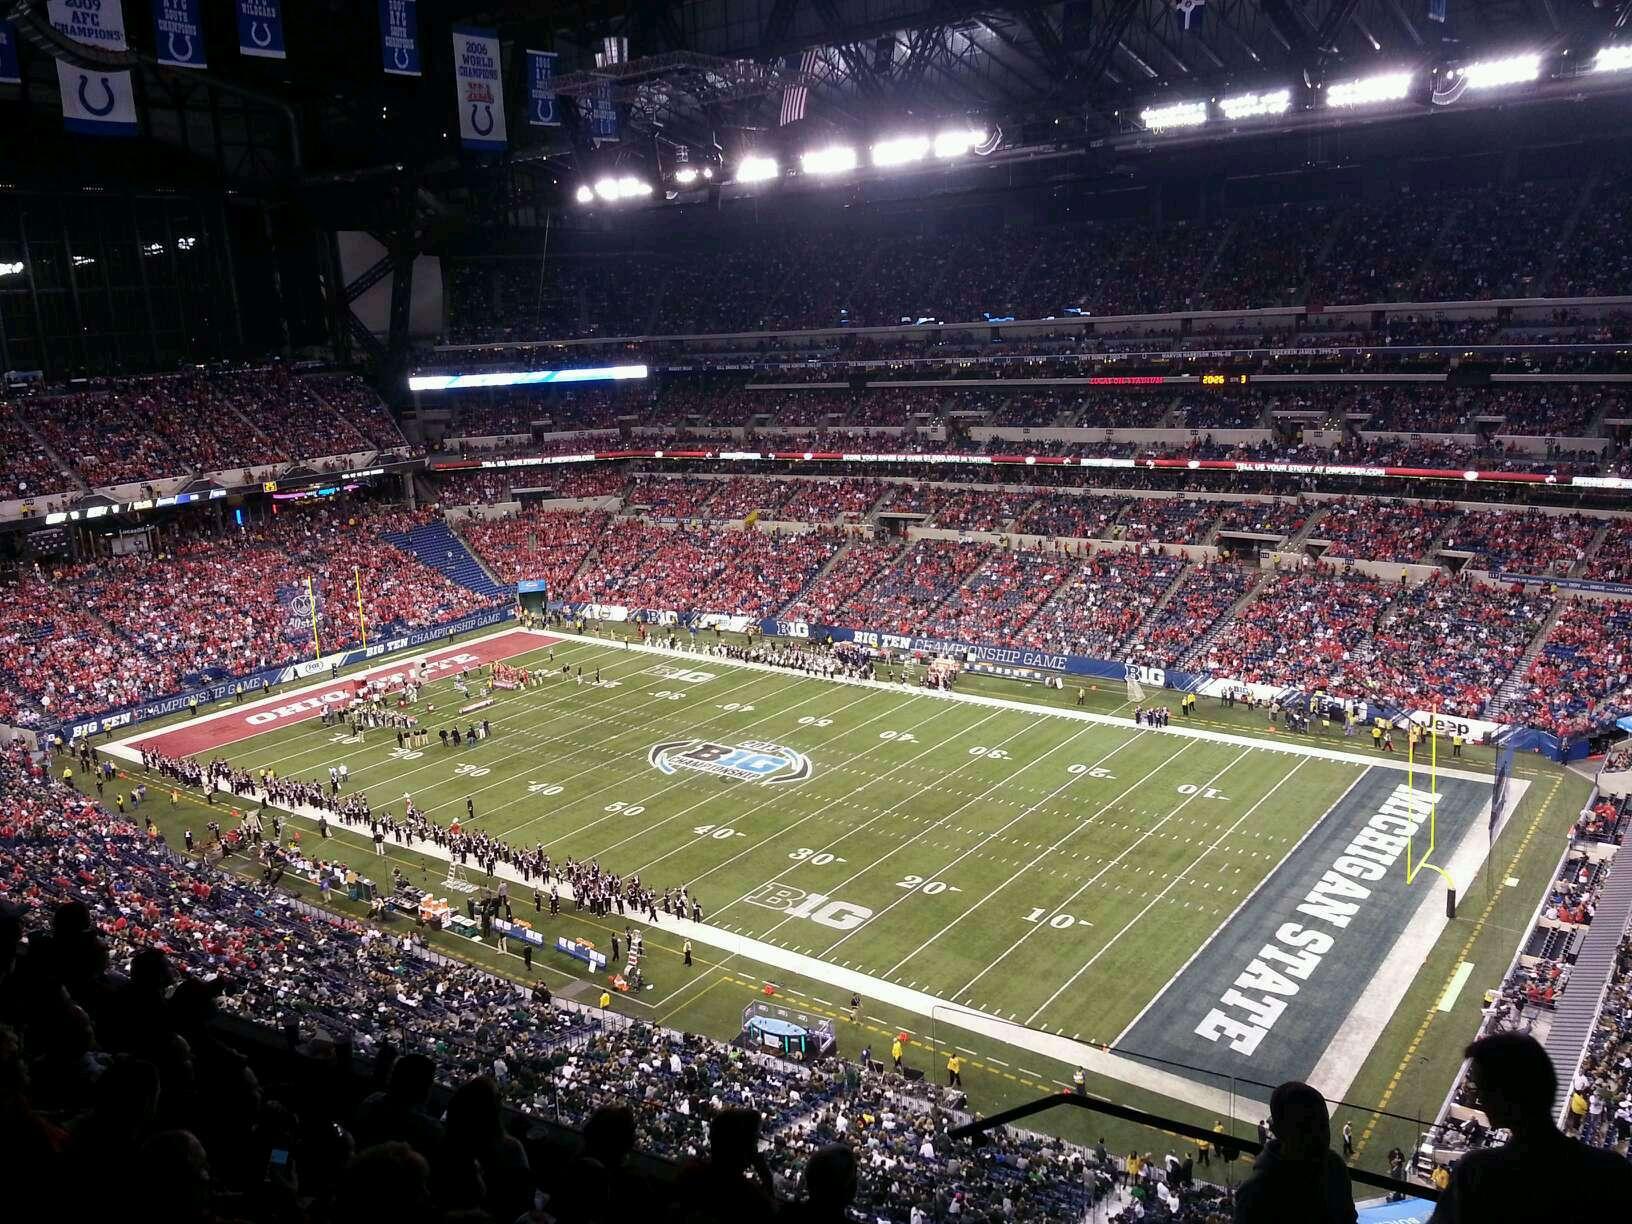 Lucas Oil Stadium Section 635 Row 6 Seat 1